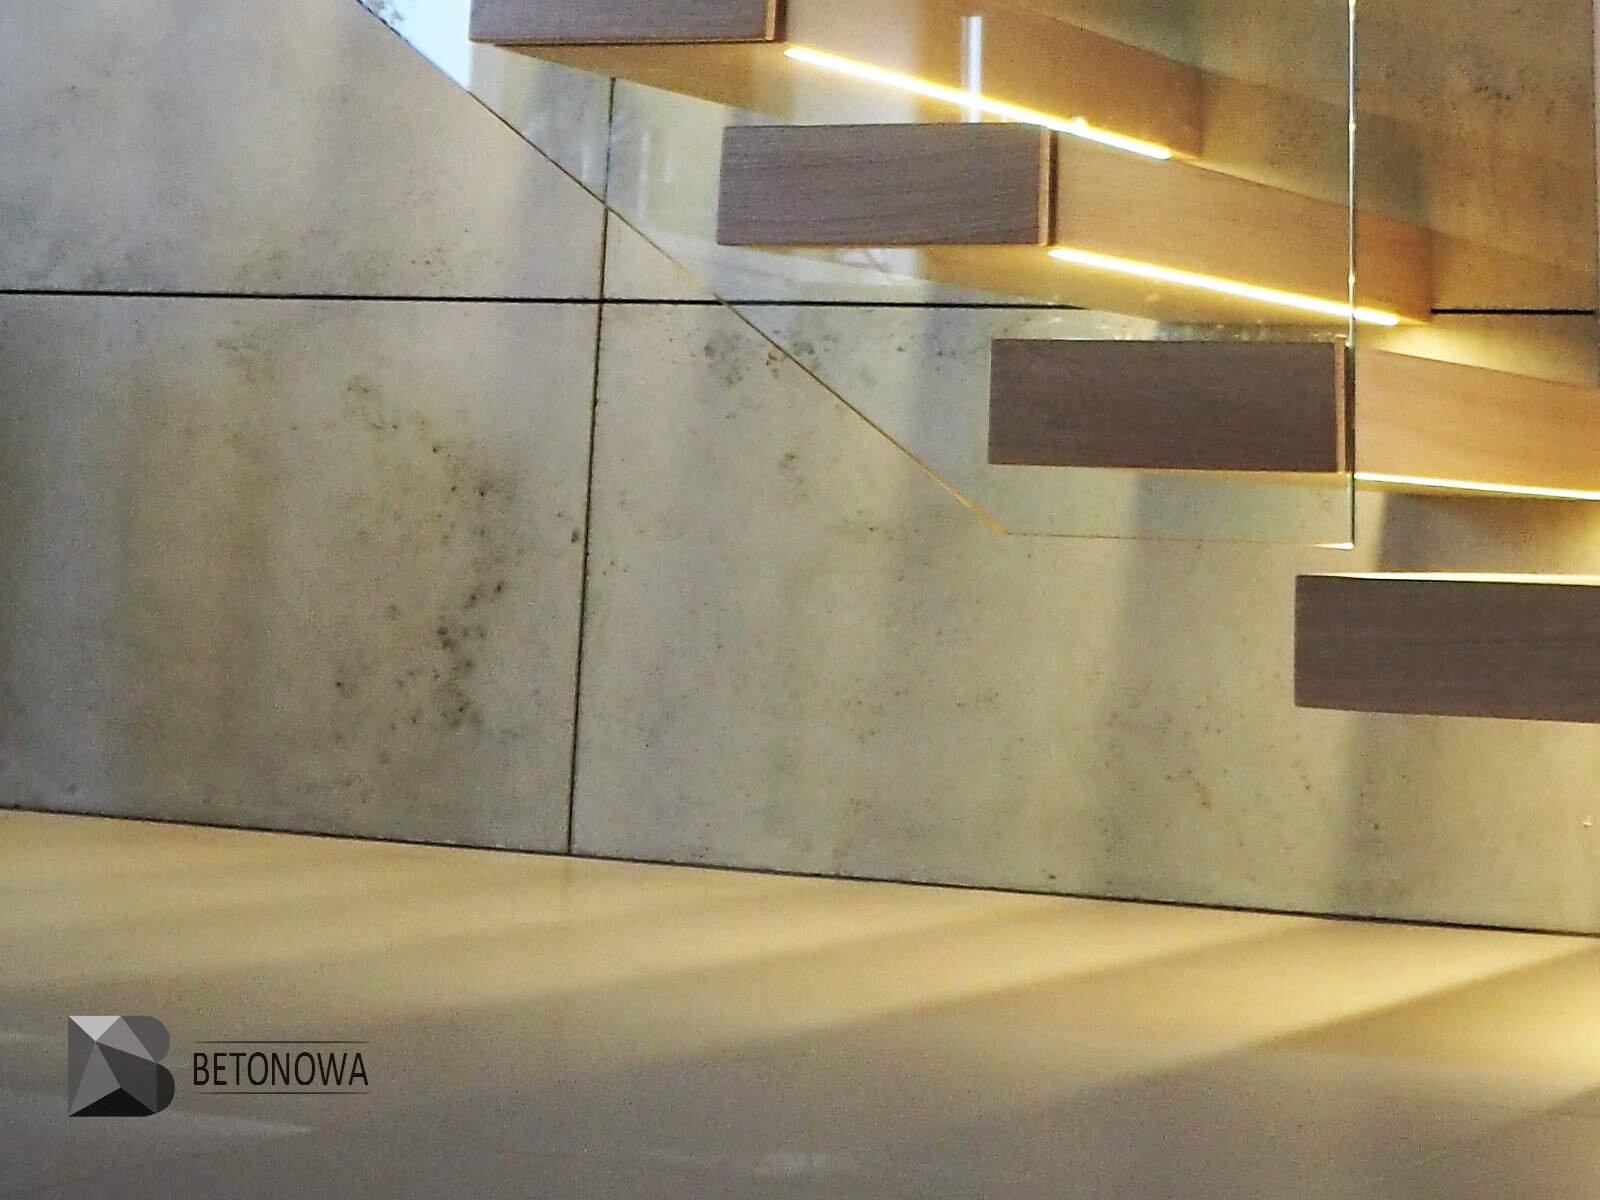 beton na cian w salonie azience biurze lub na elewacj. Black Bedroom Furniture Sets. Home Design Ideas